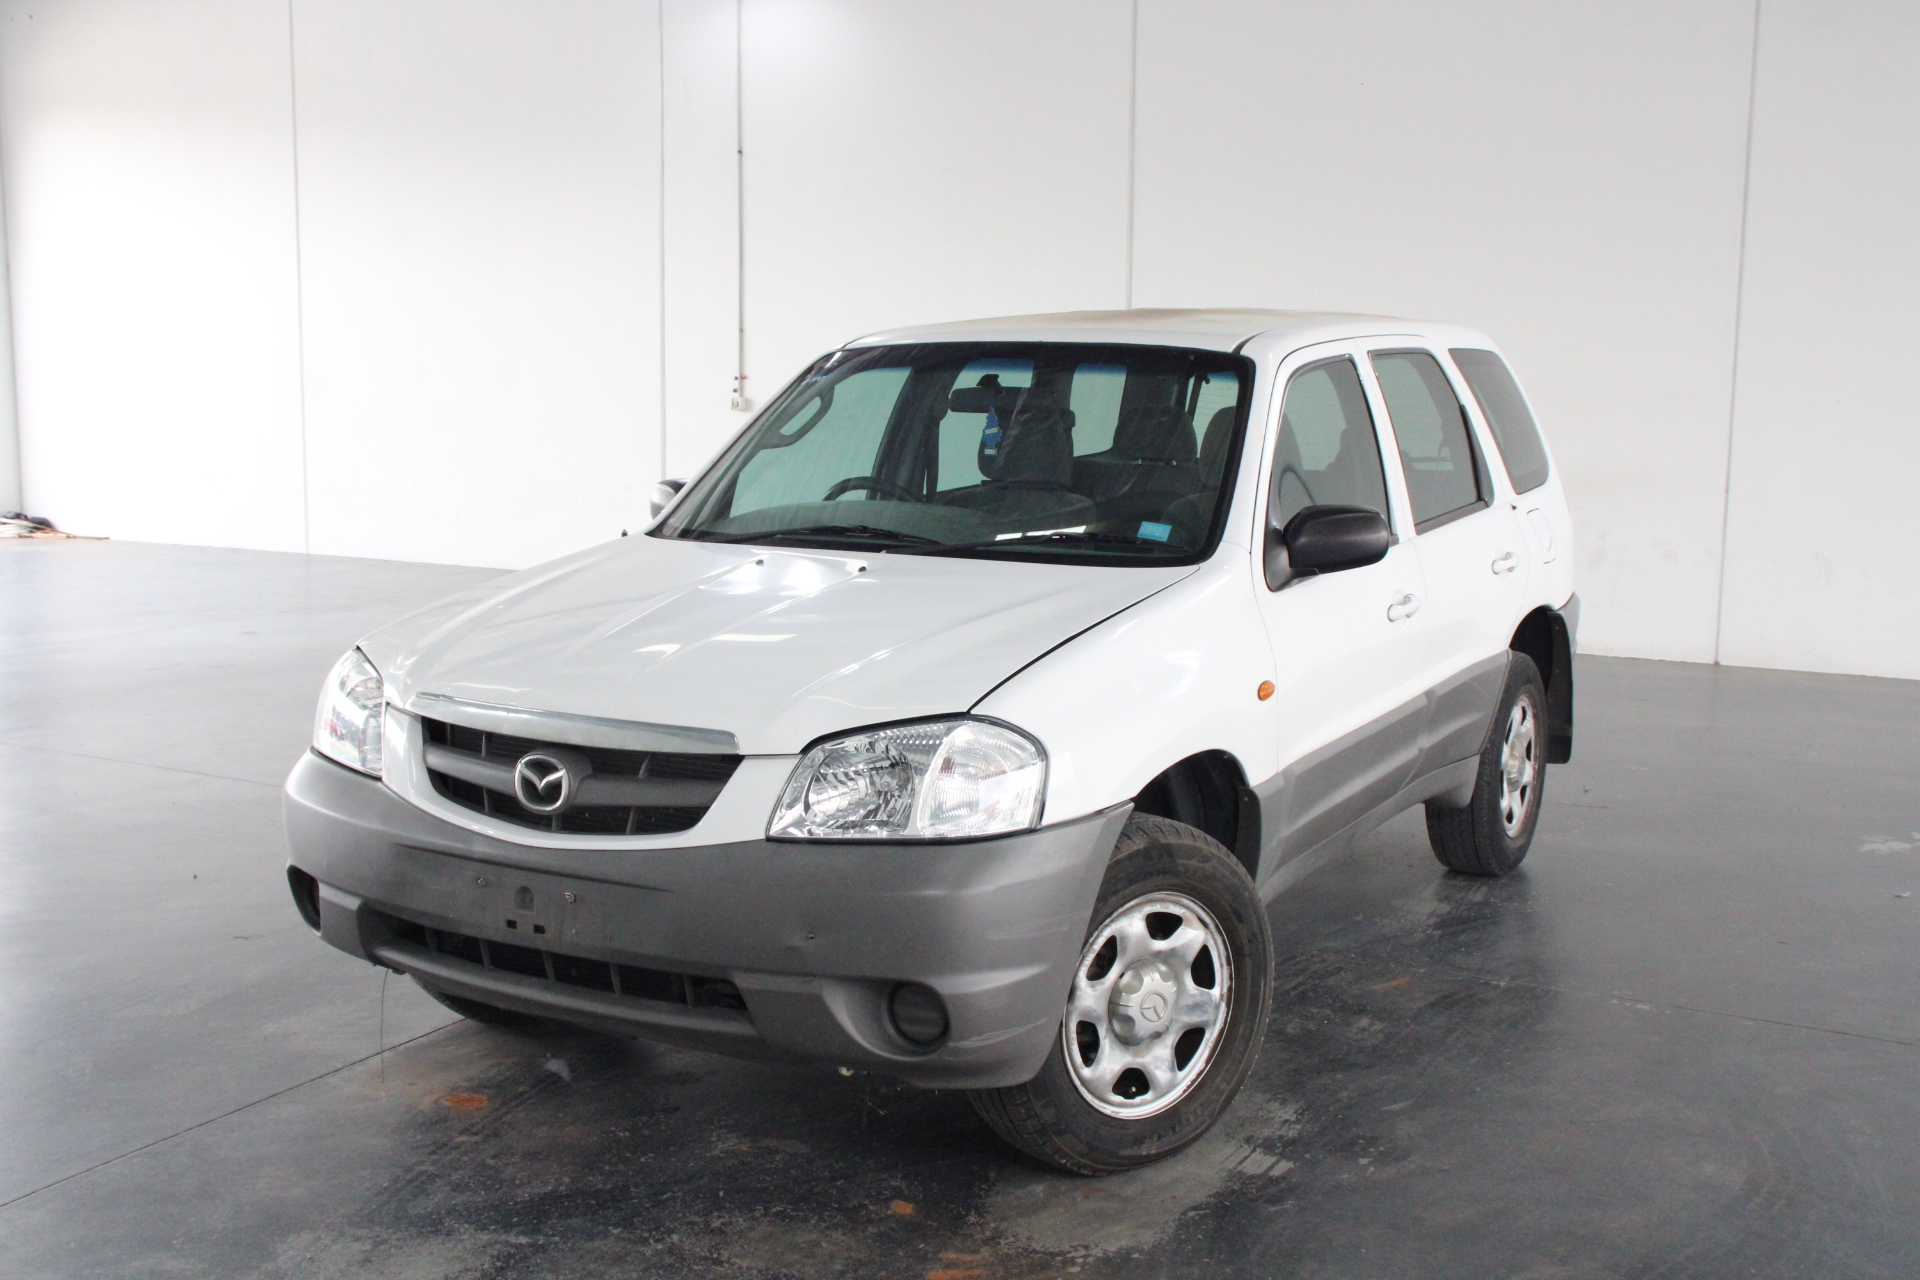 2001 Mazda Tribute Limited Automatic Wagon